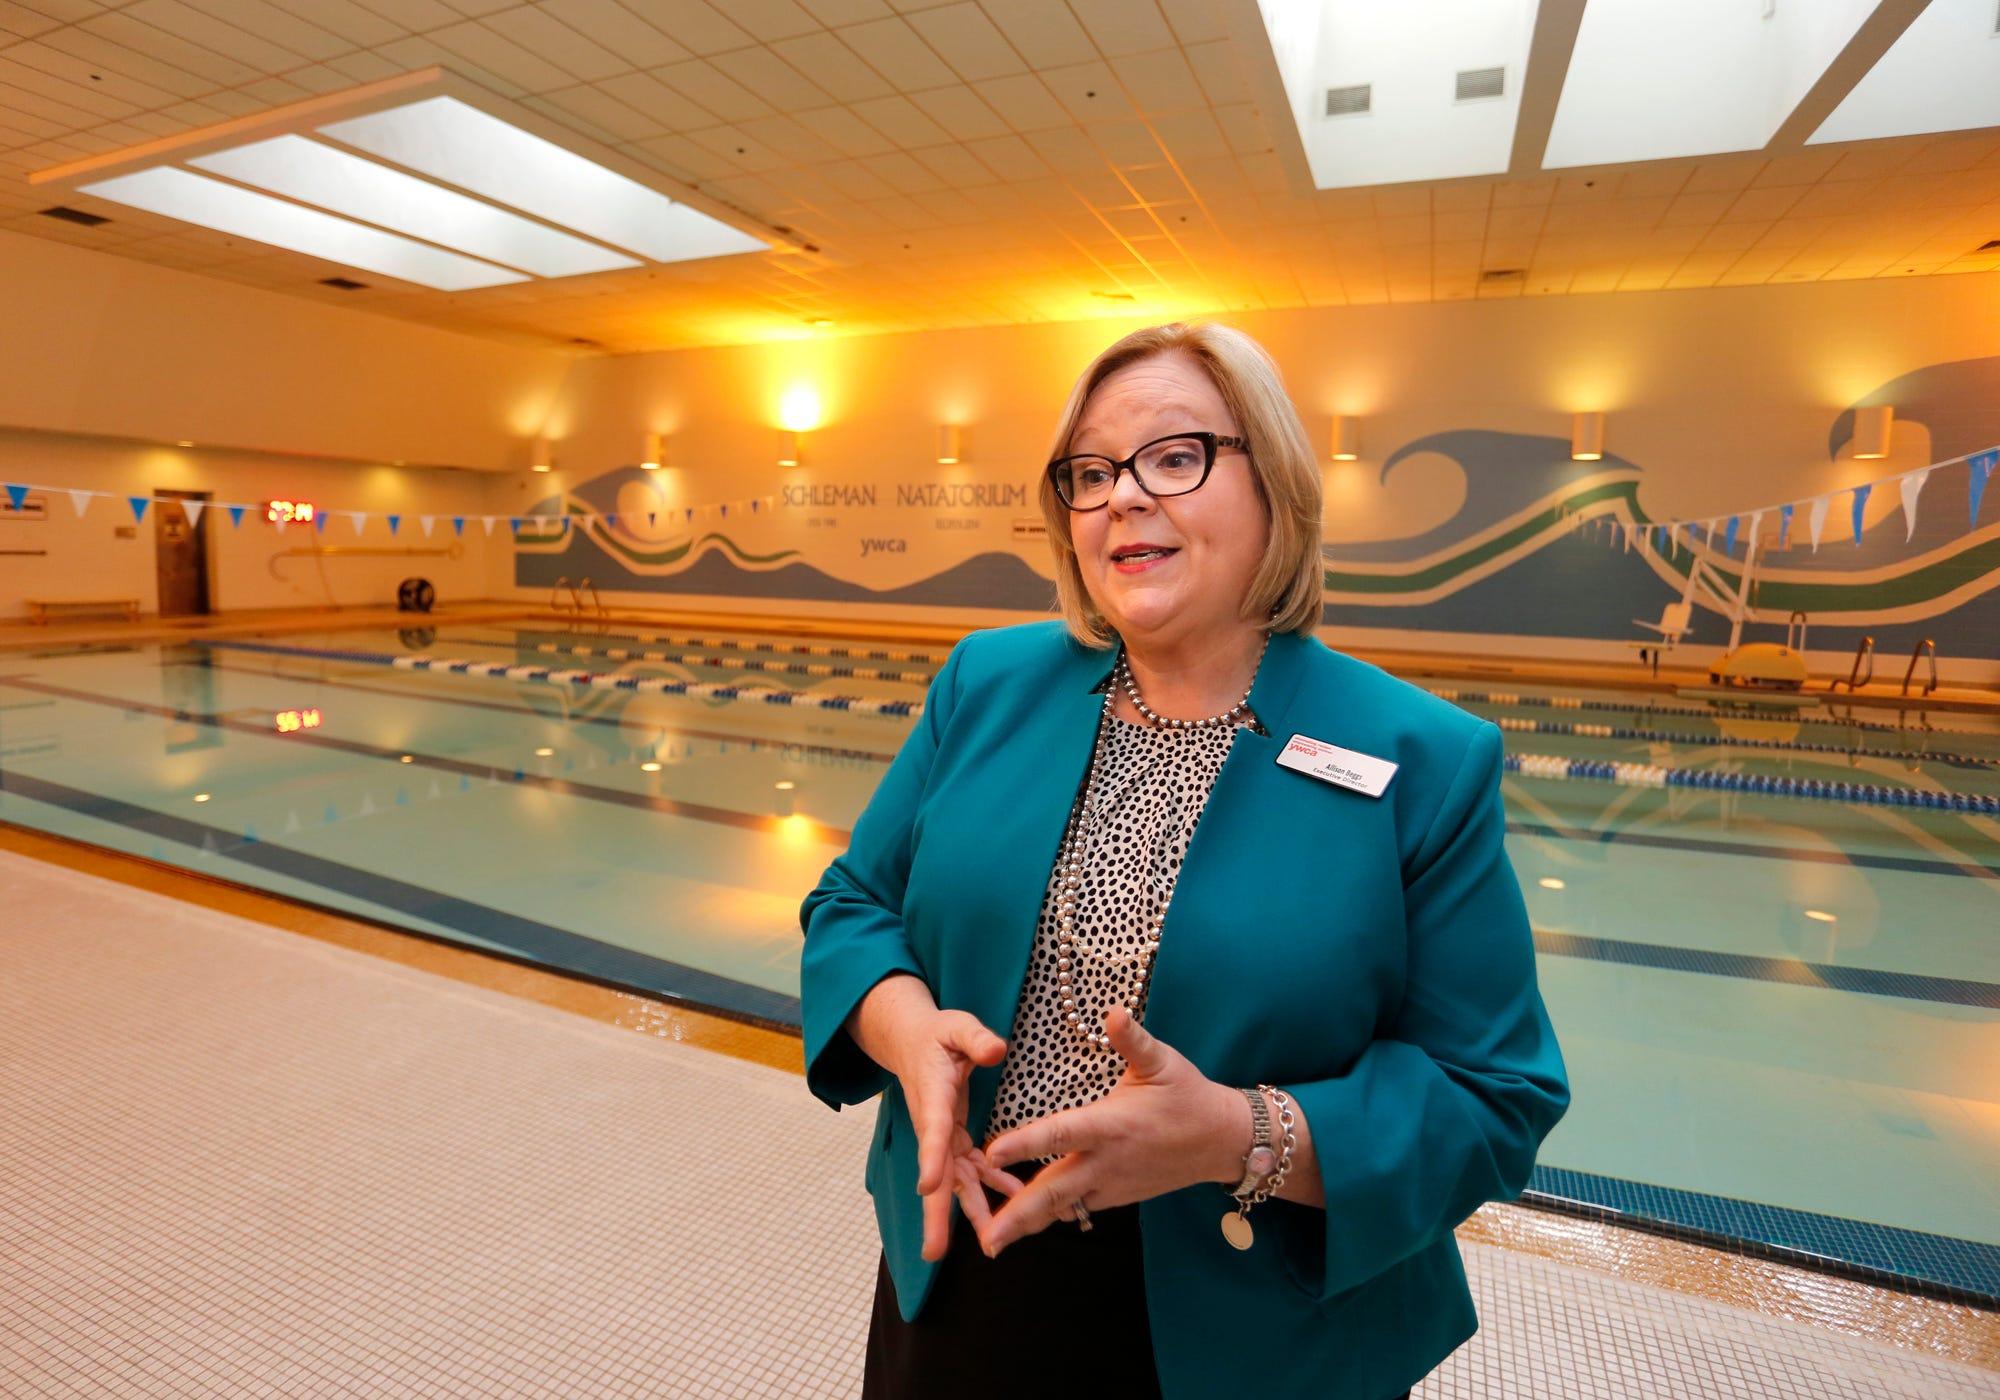 Laf Ywca Closing Its Pool In Downtown Again